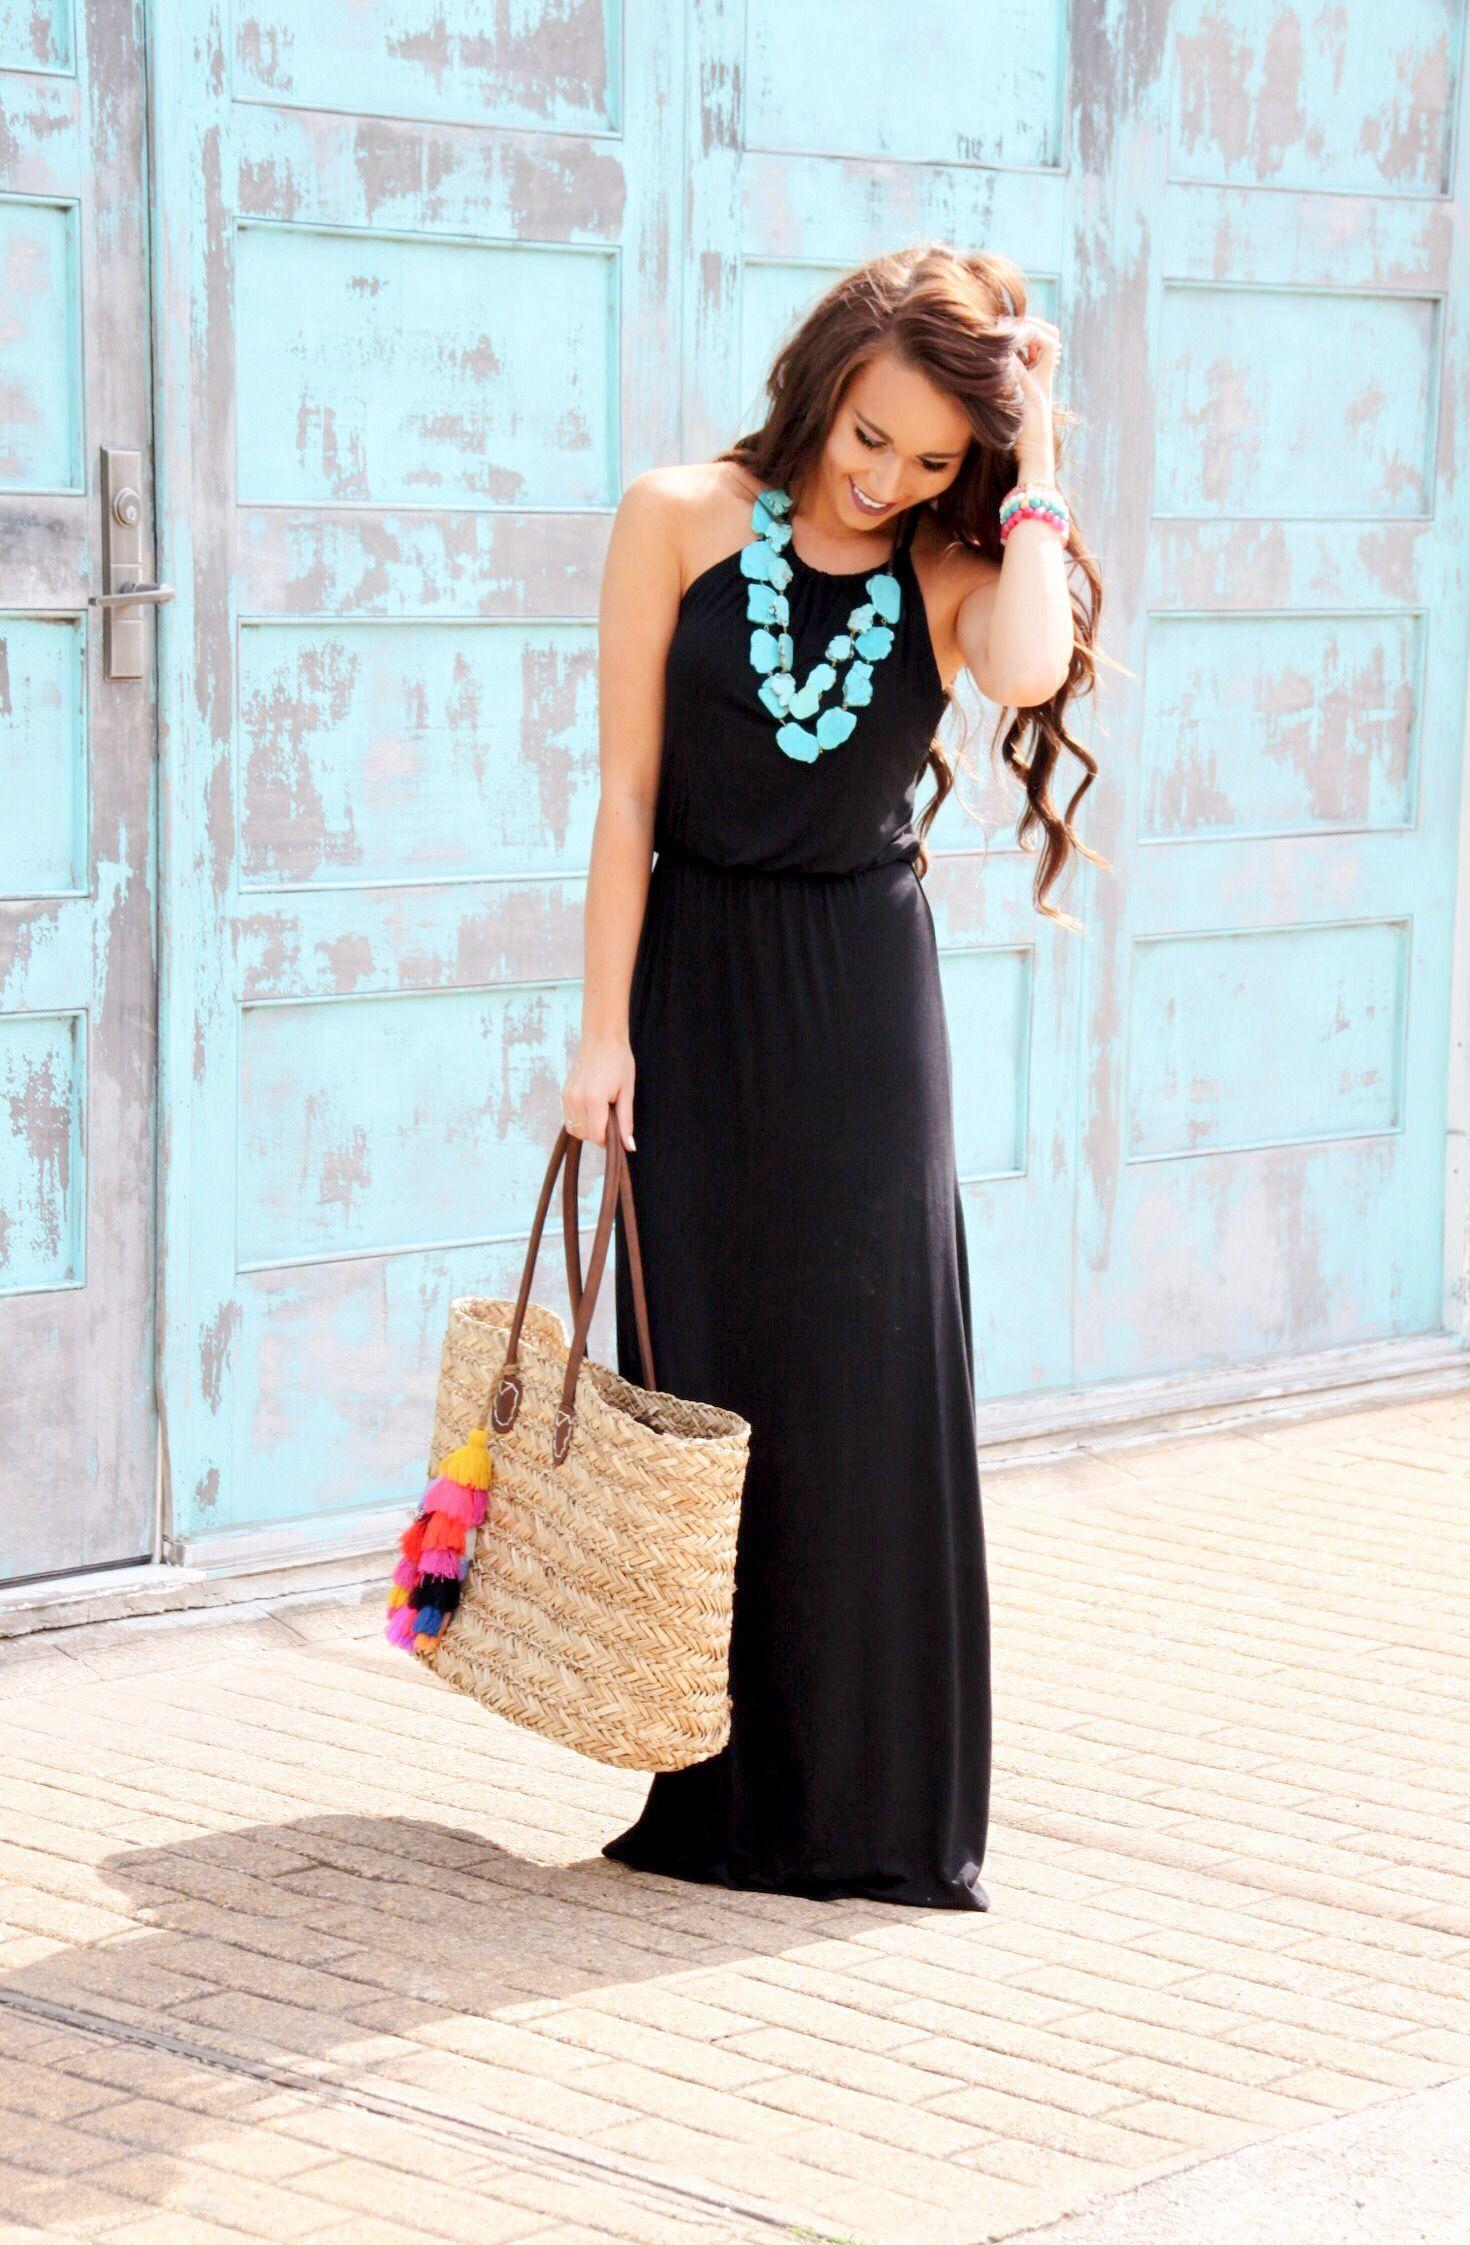 912bbc5f8d Black Maxi and Tassel Beach Bag - Sunshine & Stilettos Blog | Get in ...